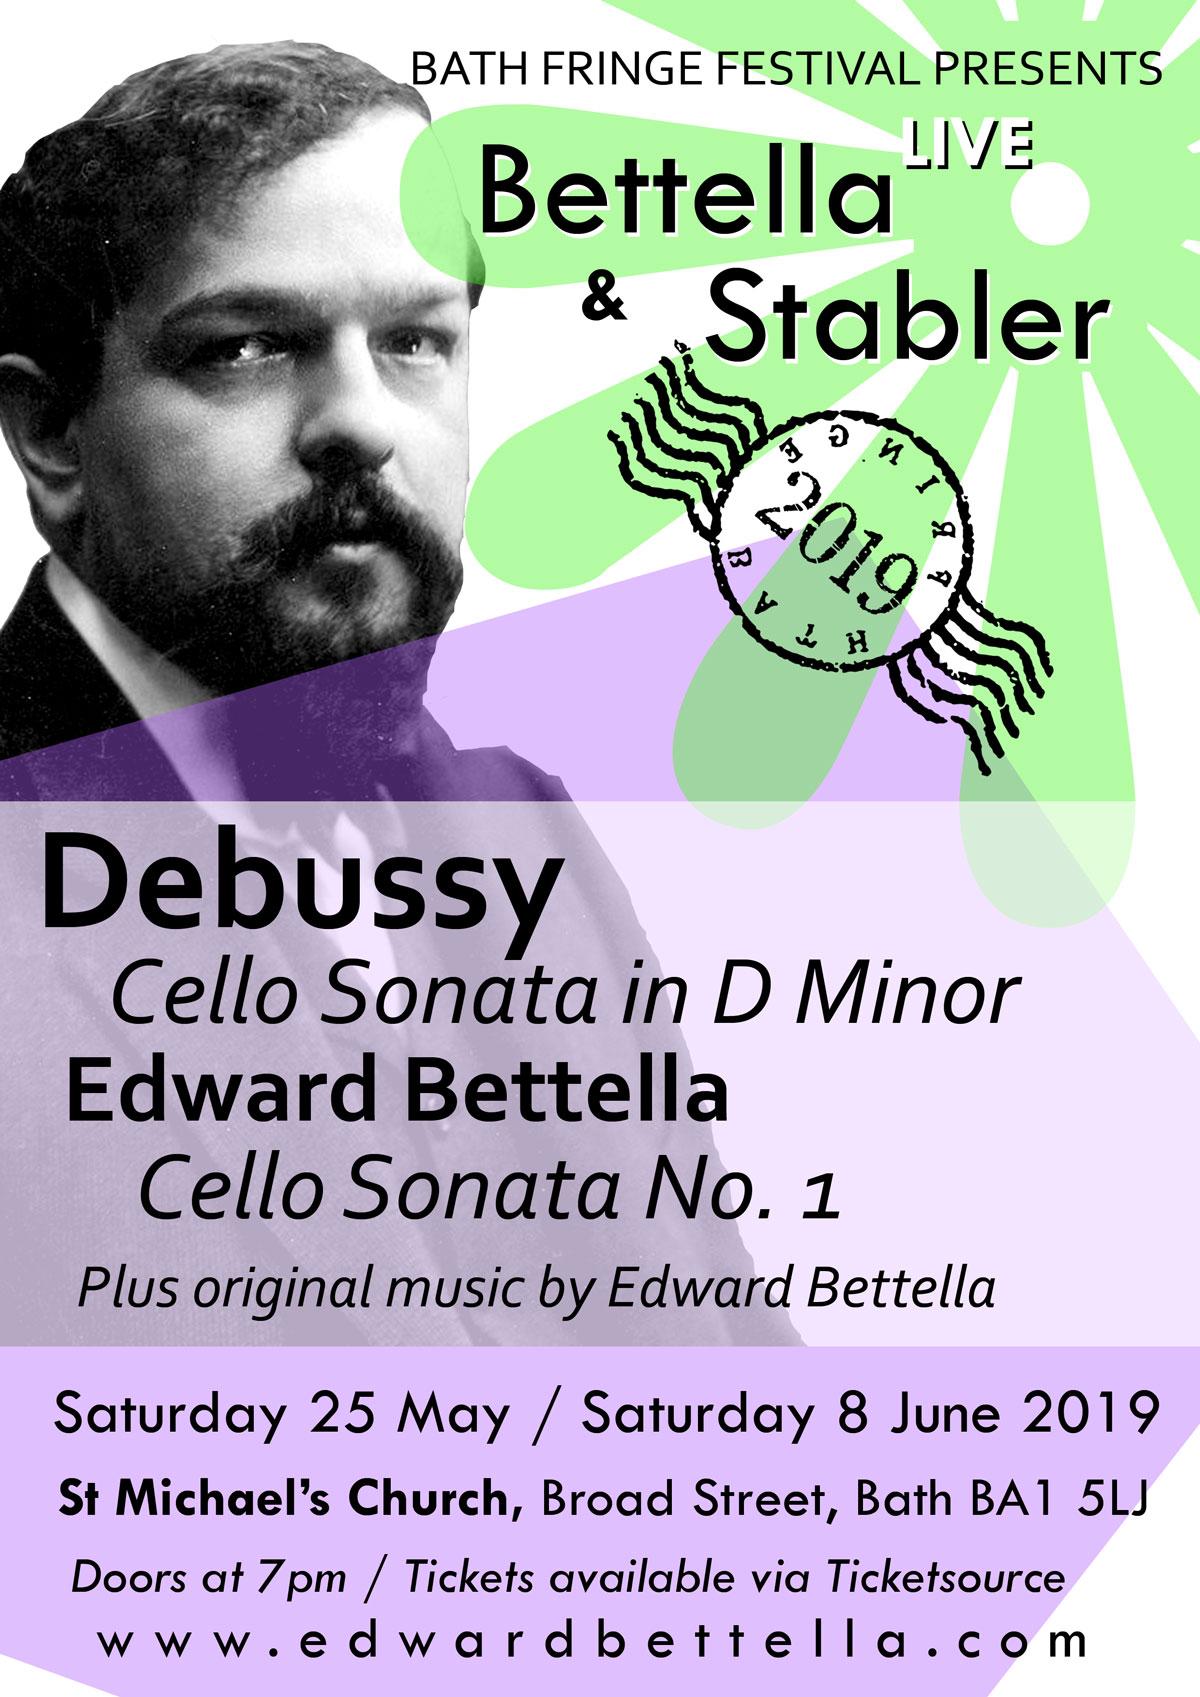 Bath Fringe Festival 25.5.2019